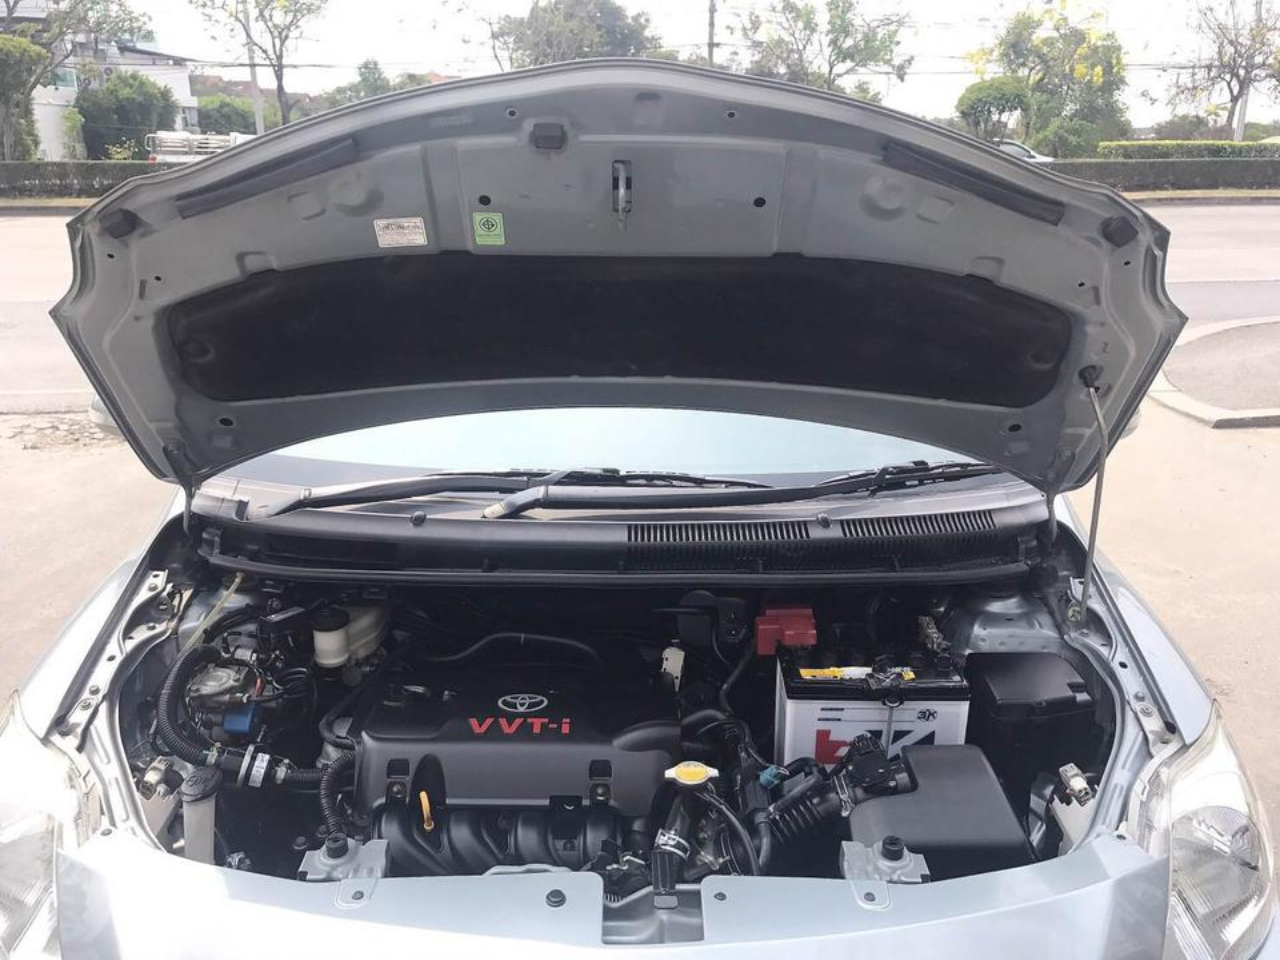 TOYOTA VIOS 1.5 J Auto ปี2011 ติดแก็สLPGหัวฉีดถังโดนัทสองระบบประหยัด รูปที่ 6